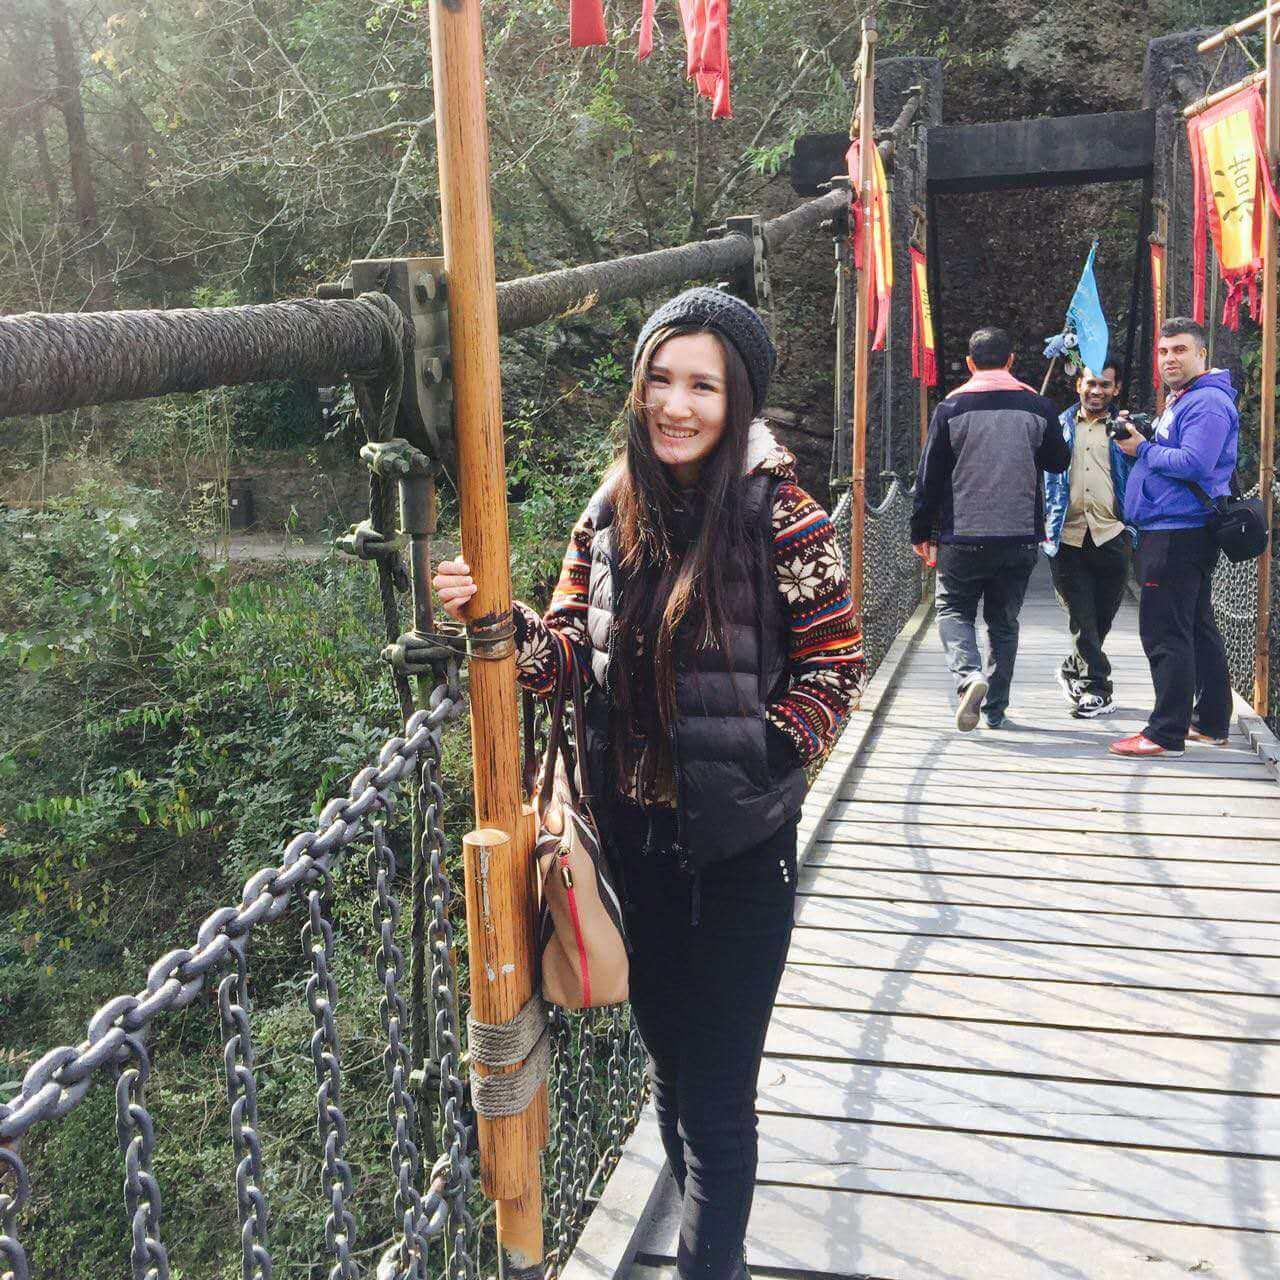 chengdu westchinago tour guide: Heather